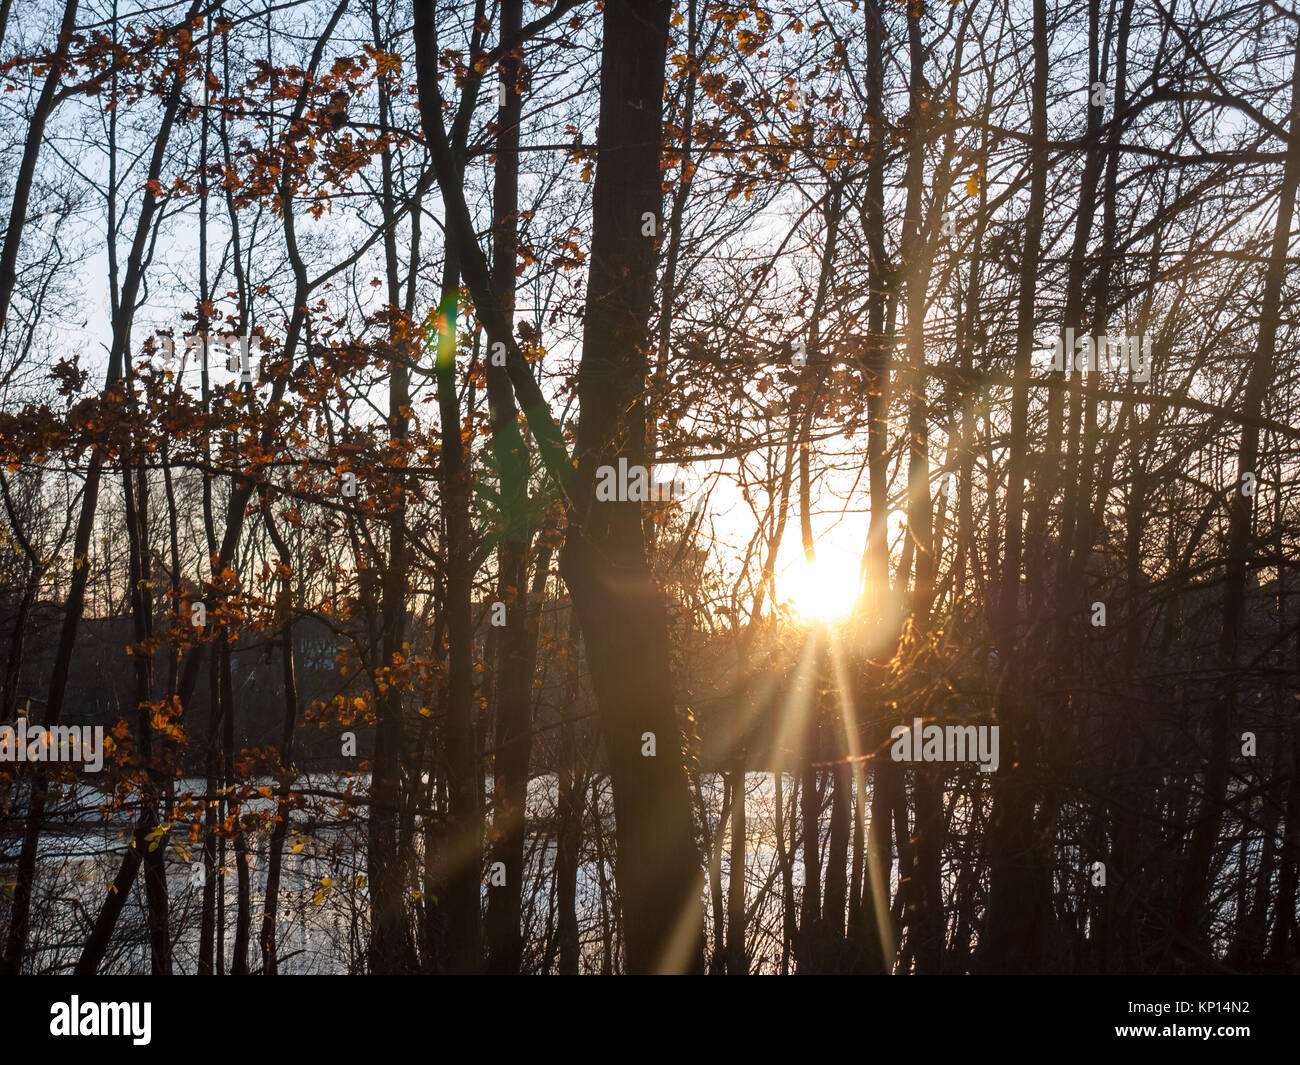 autumn sunset light through forest trees scene beauty landscape sun flare; essex; england; uk - Stock Image